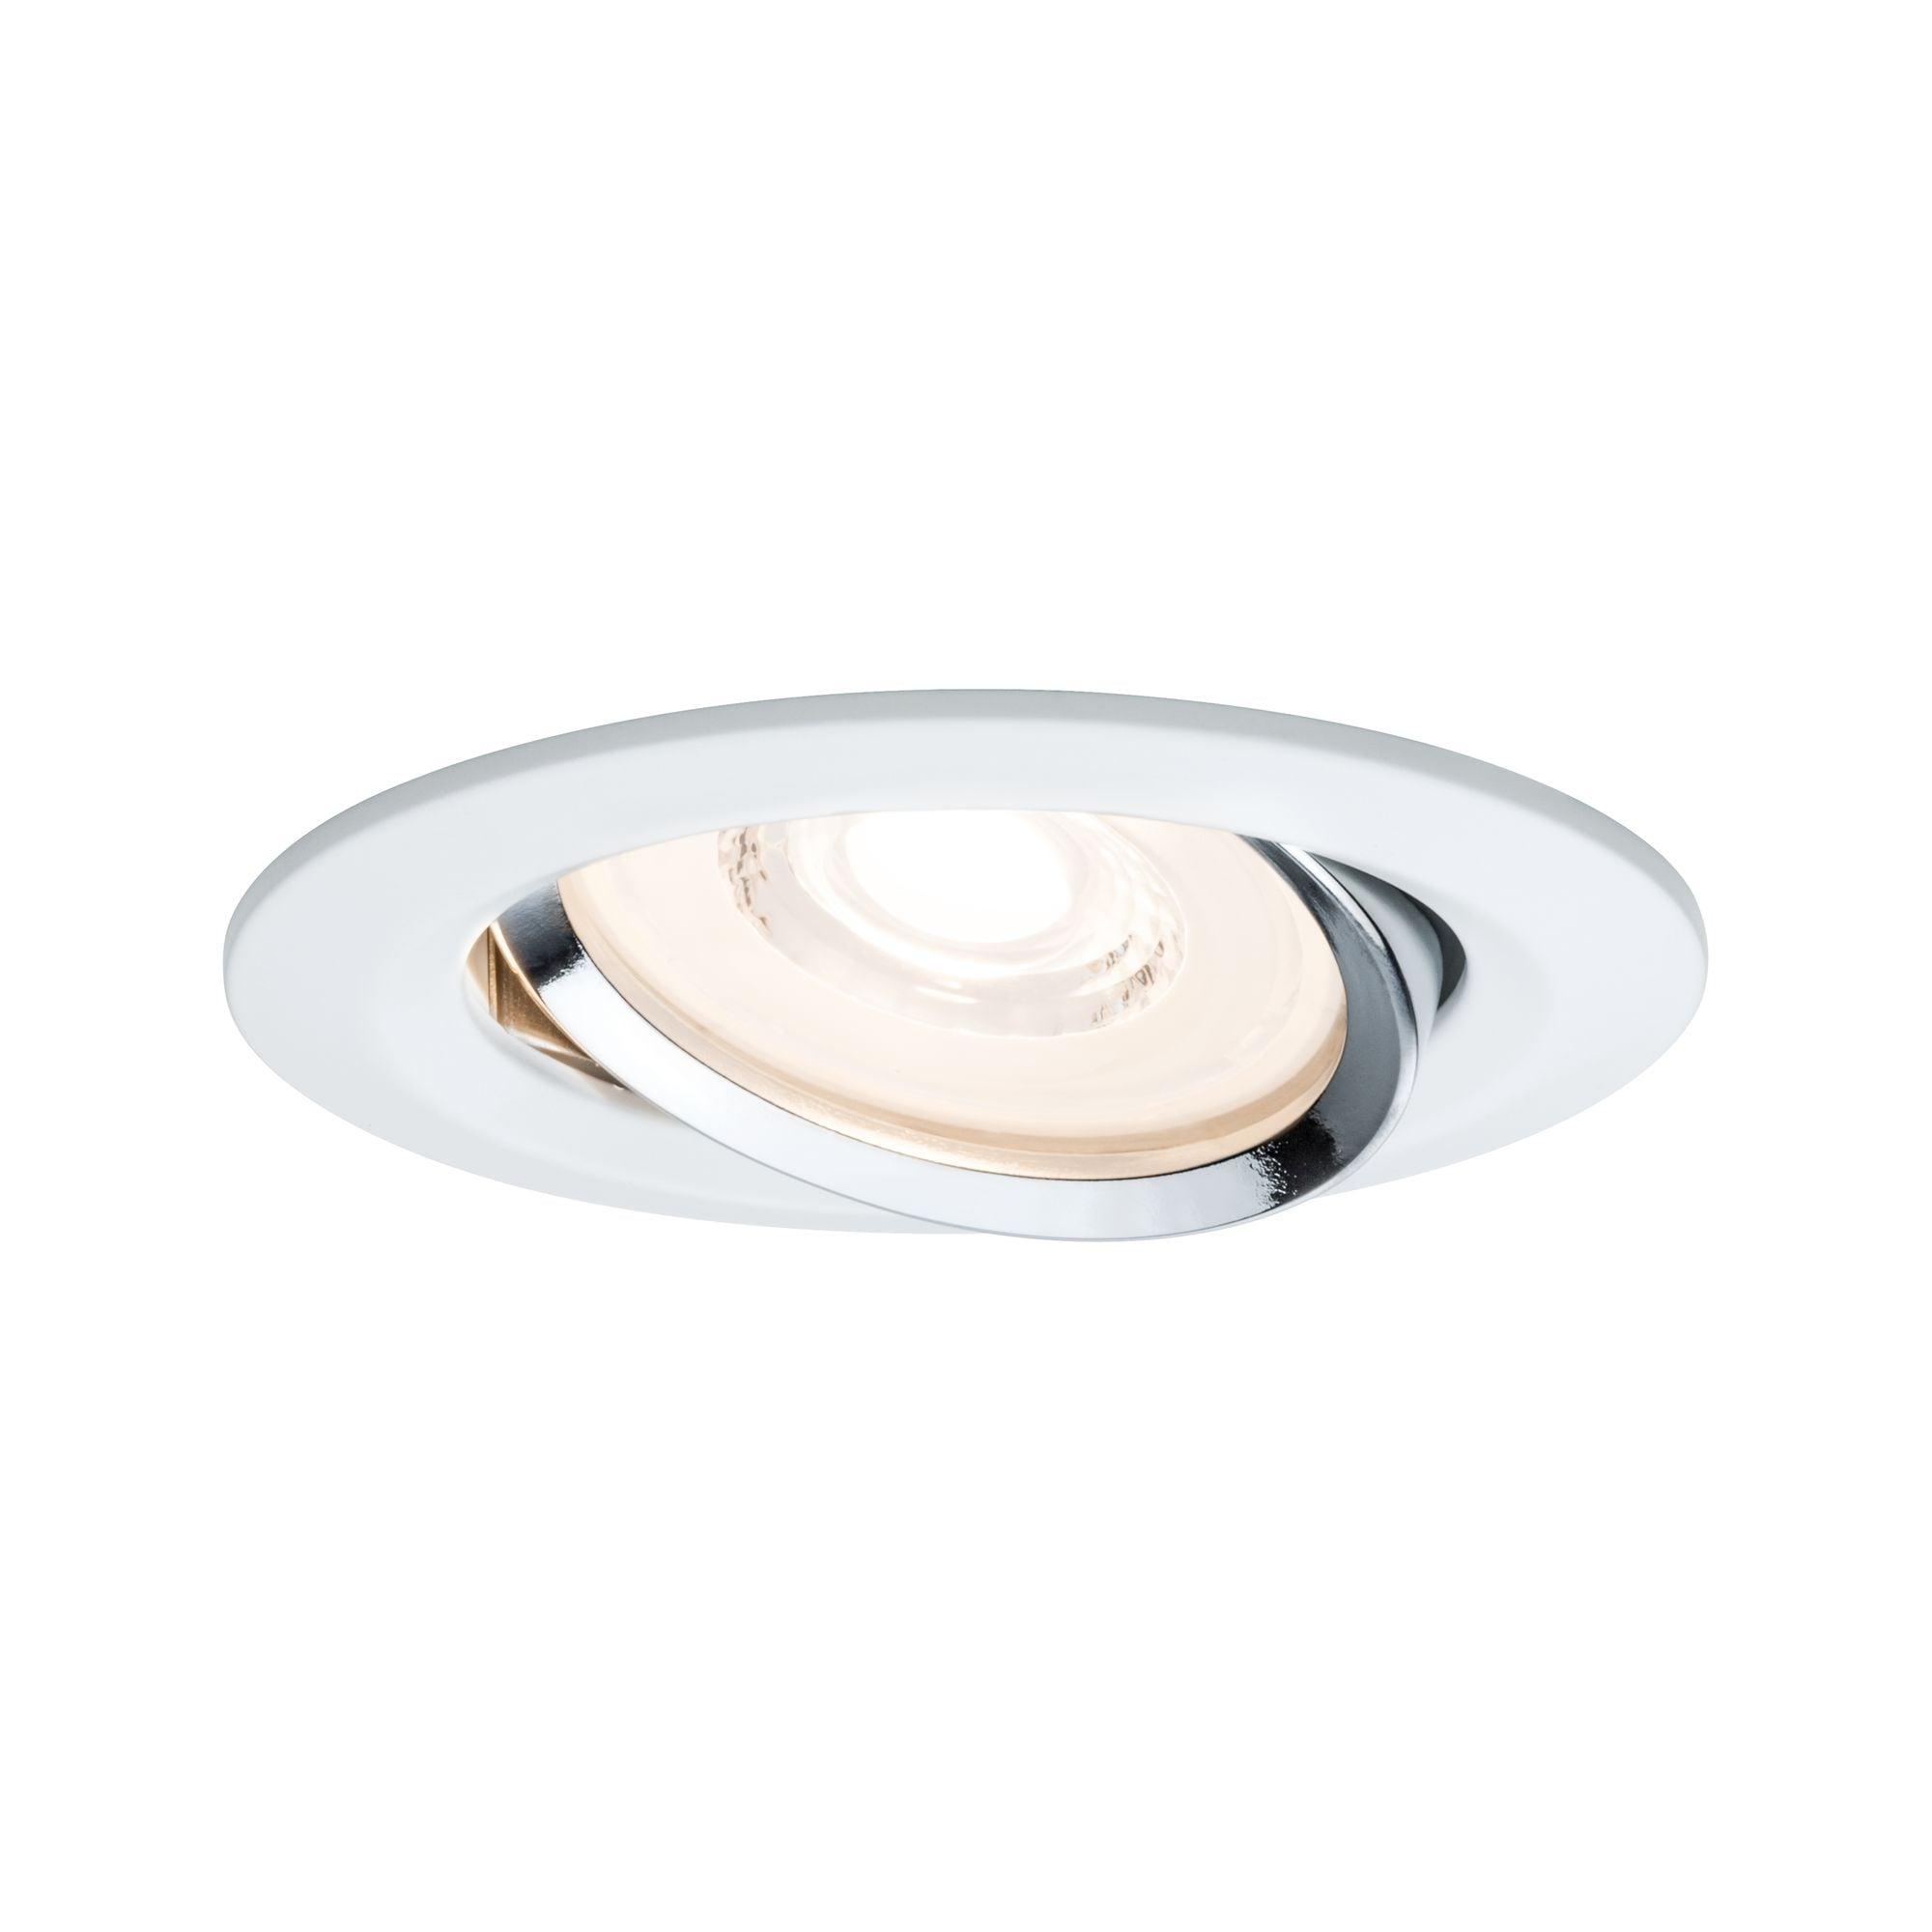 Paulmann,LED Einbaustrahler 1er-Set dimmbar schwenkbar Reflector Coin 6,8W Weiß